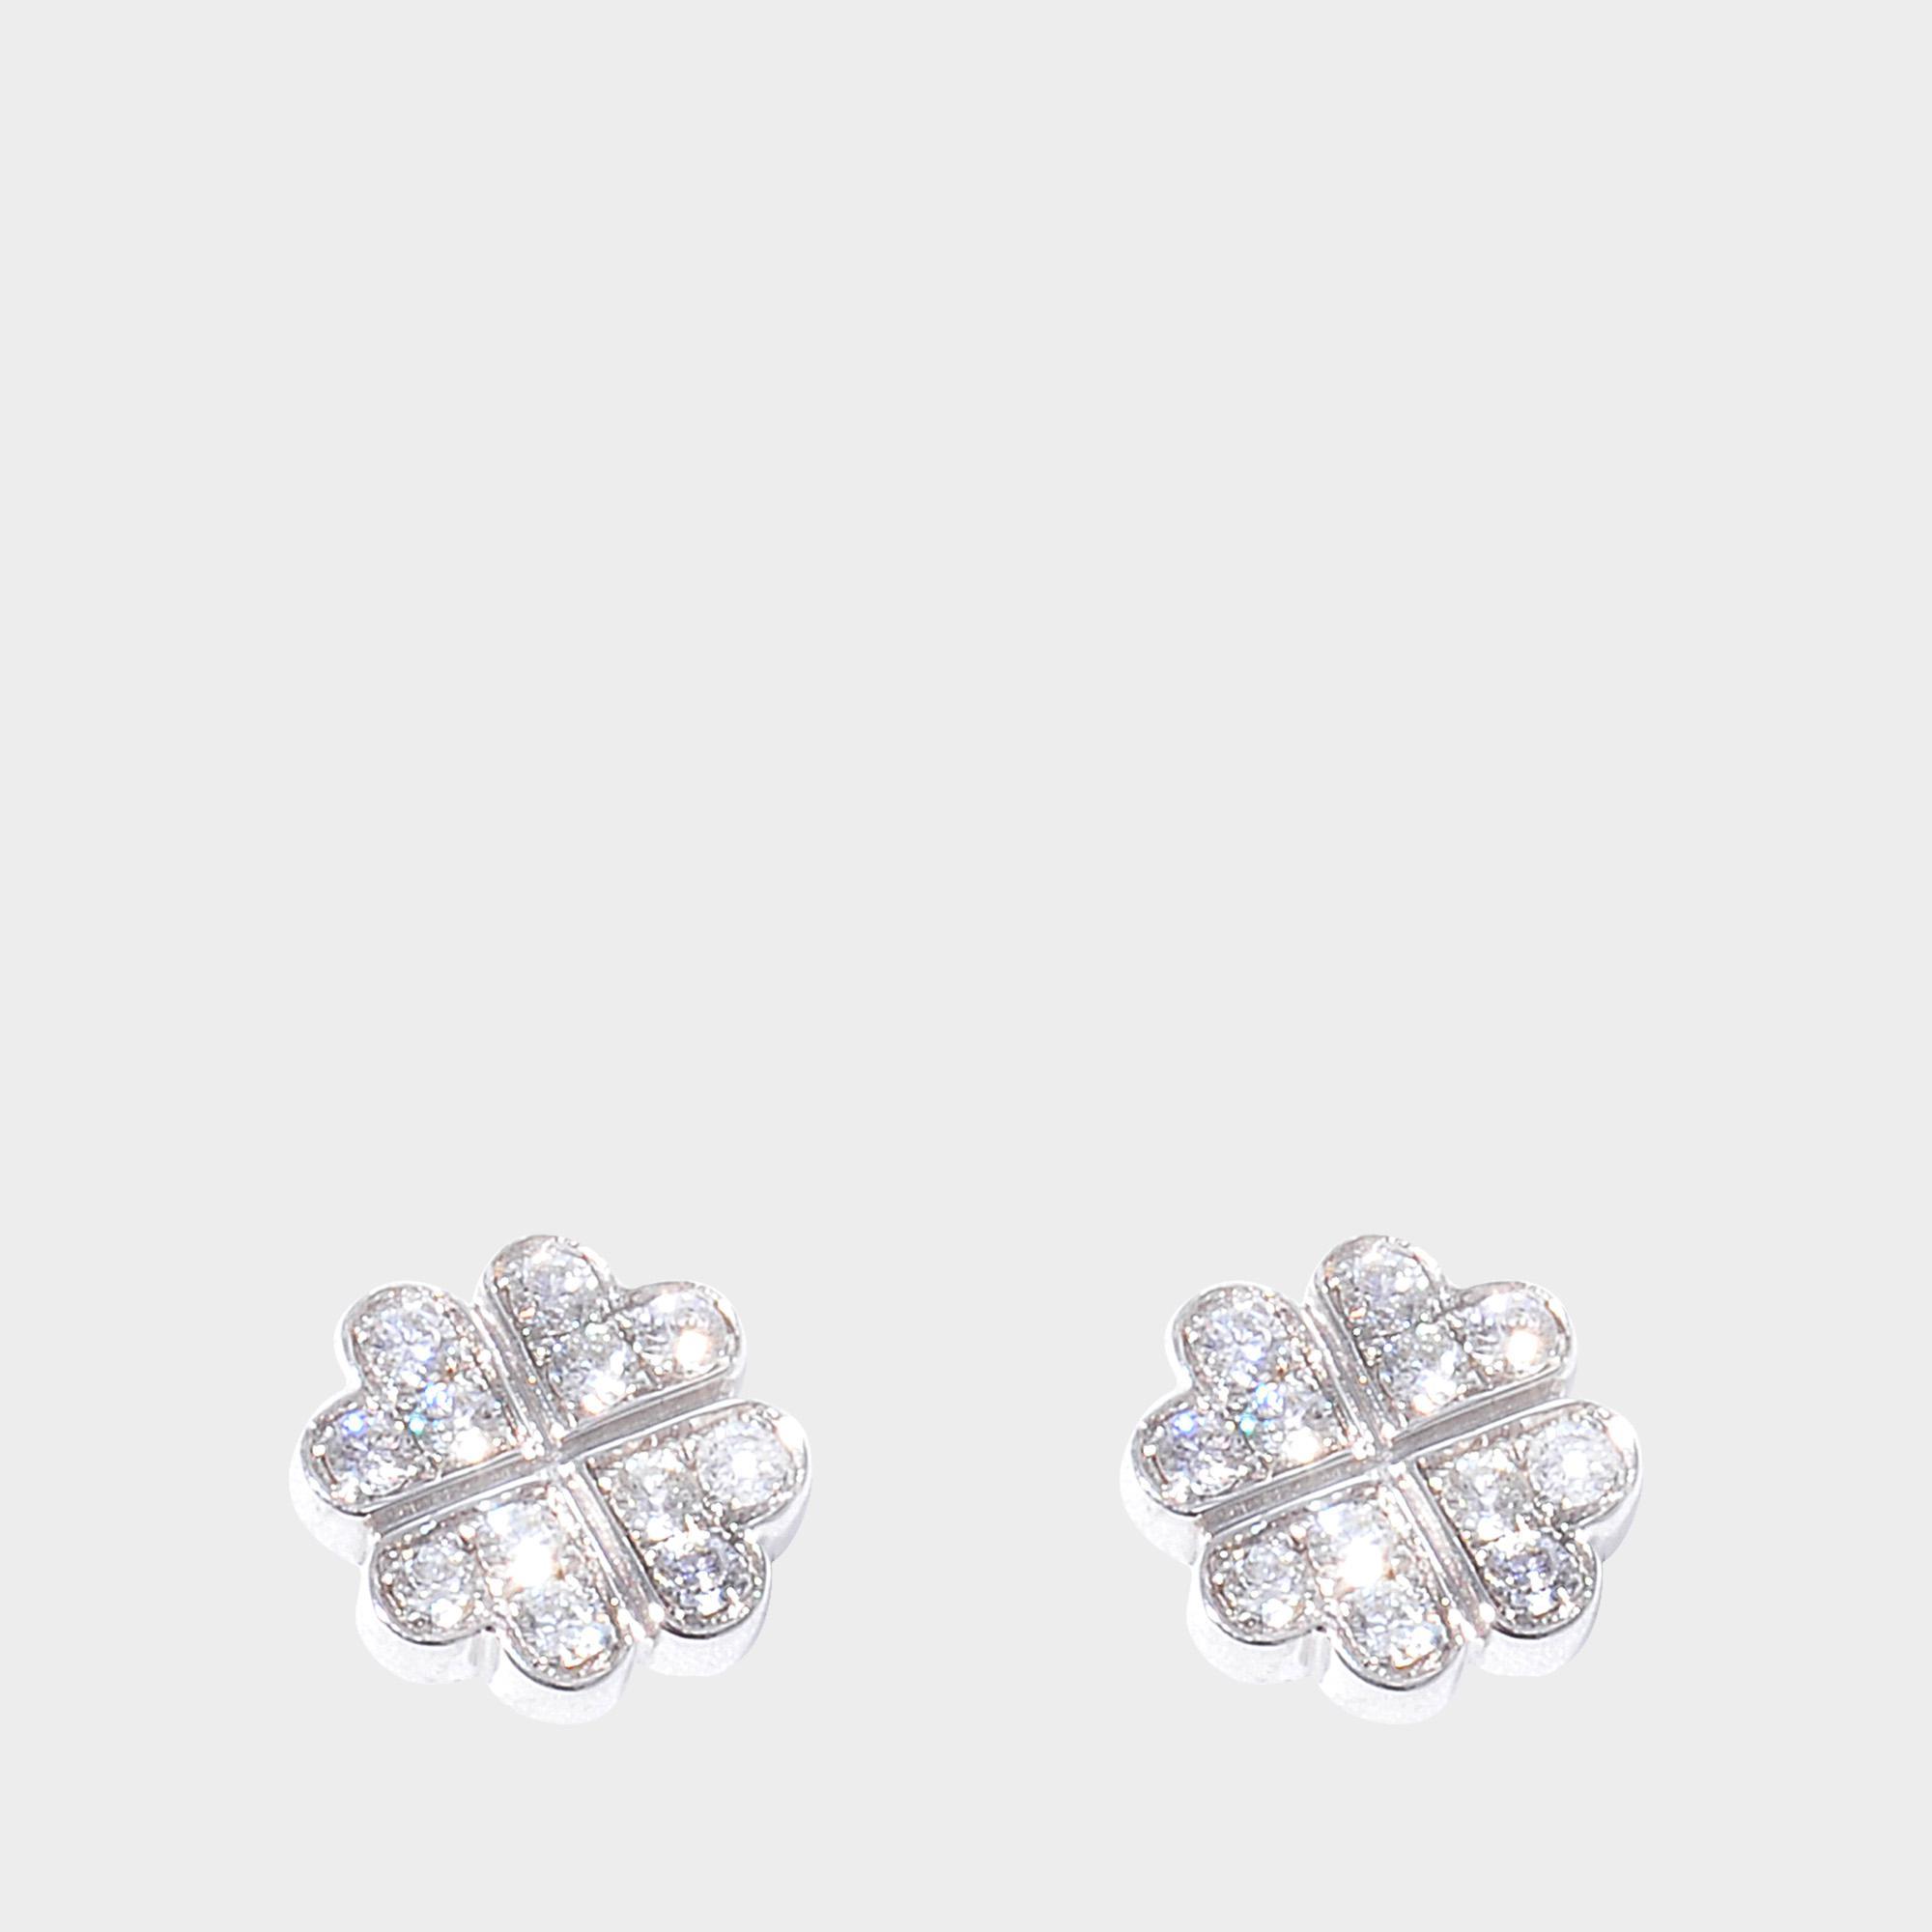 Gold Shapes Earrings Vanessa Tugendhaft R6Epbx0